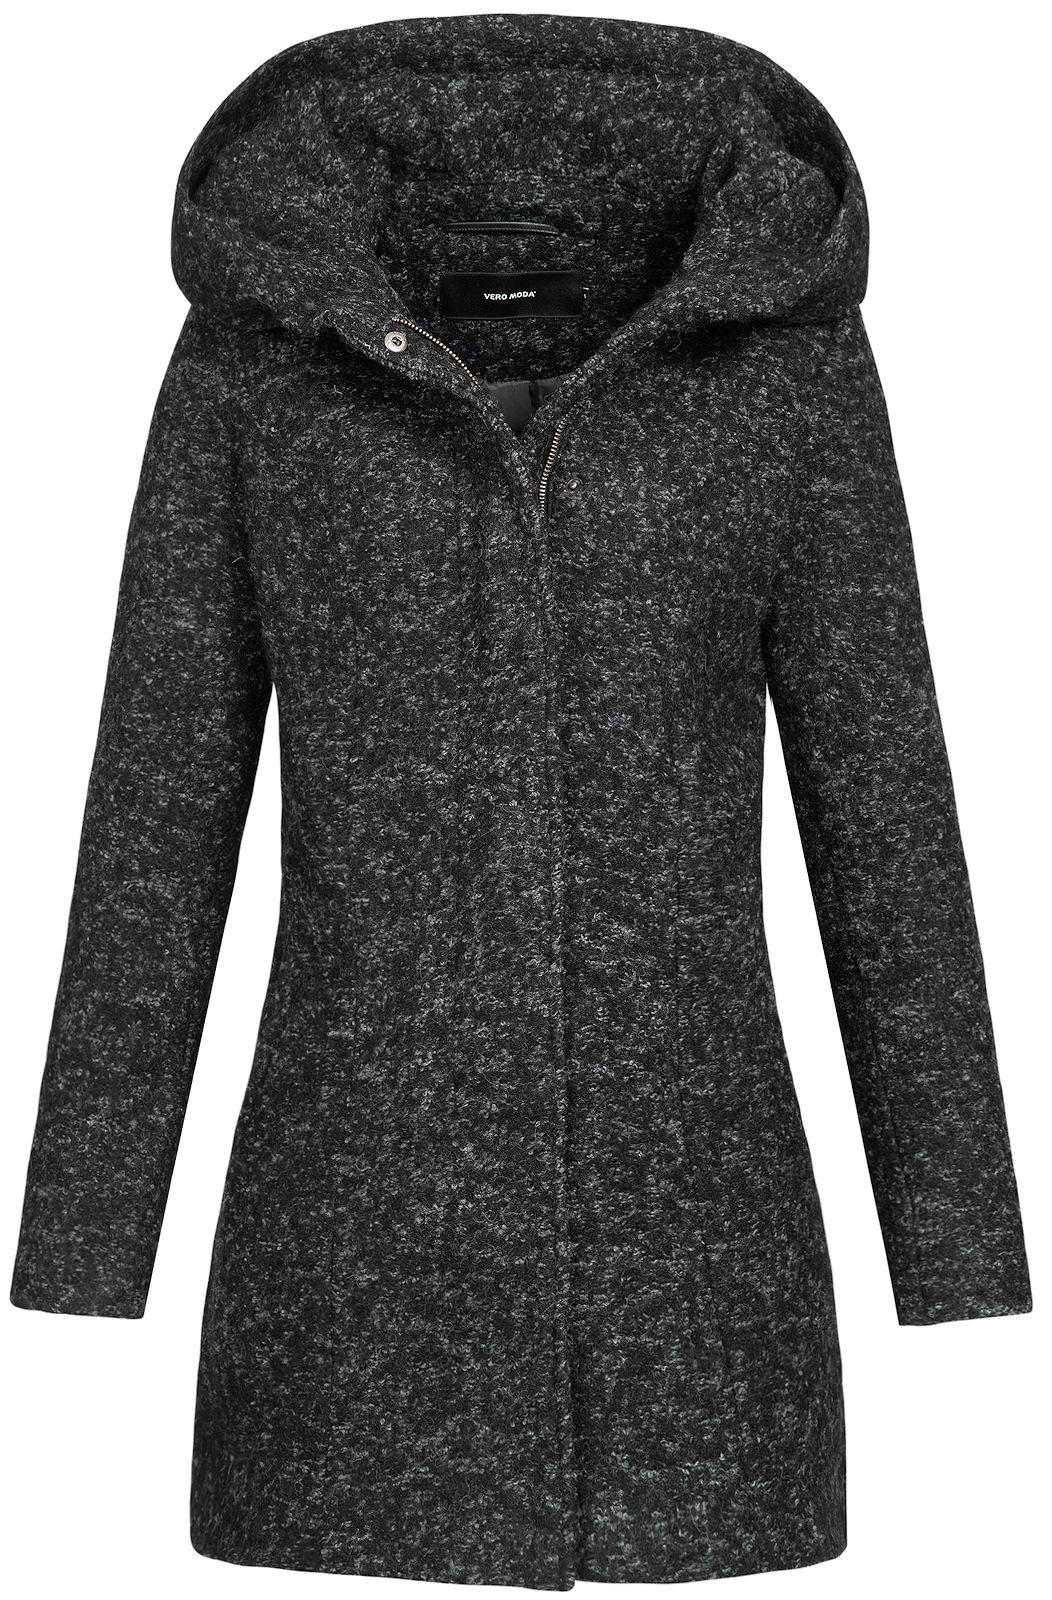 elegantes Aussehen modische Muster Mode Details zu Vero Moda Damen Mantel Parka Wollmantel Kurzmantel Jacke  Wintermantel Verodona